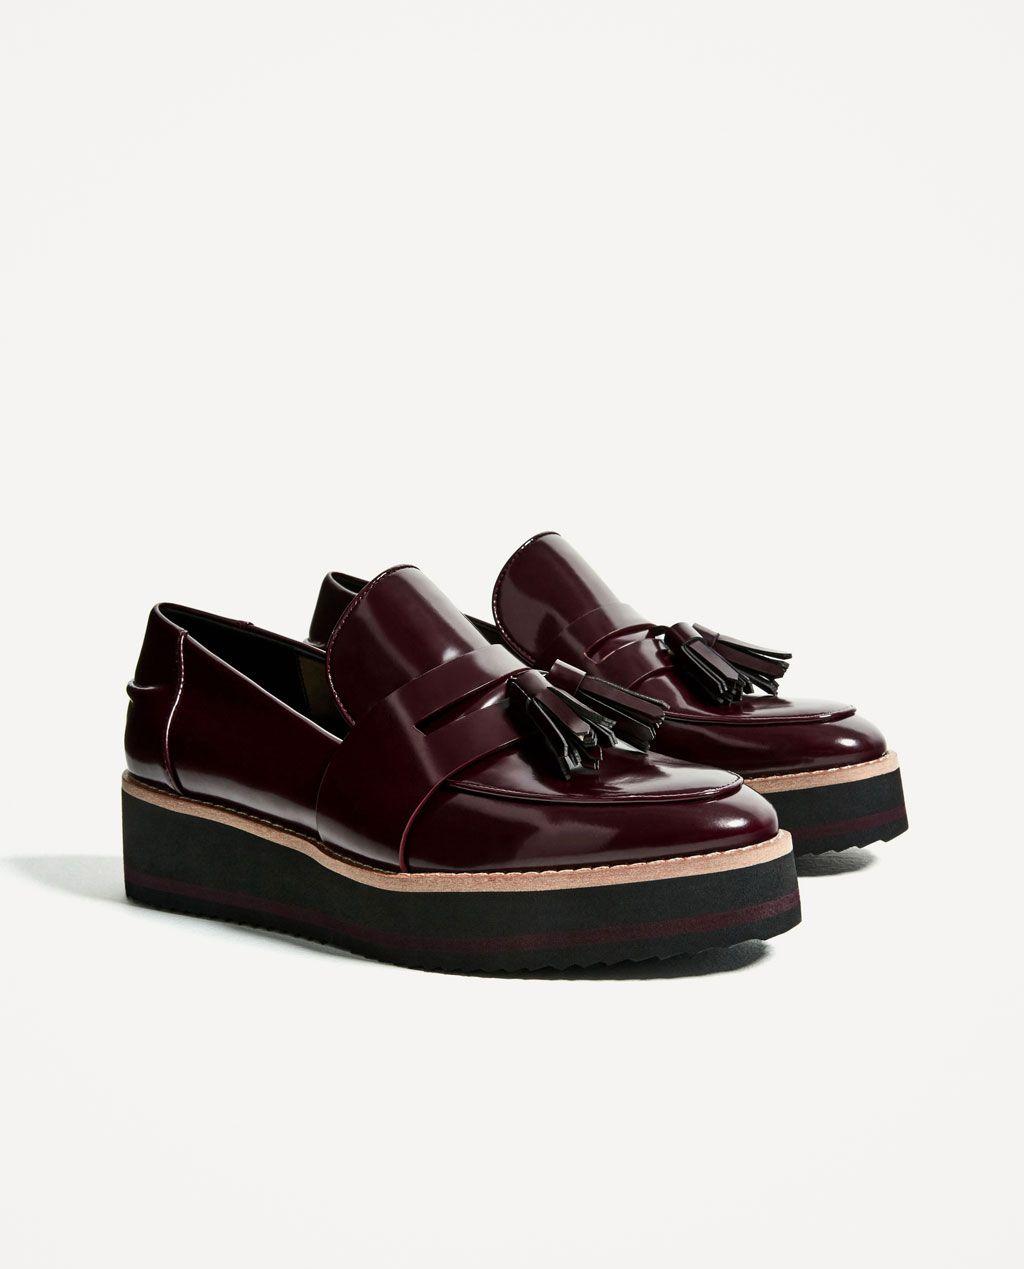 ZapatosCueroNegroCuña cm 5 Abril 4 shoes gfwq4FT